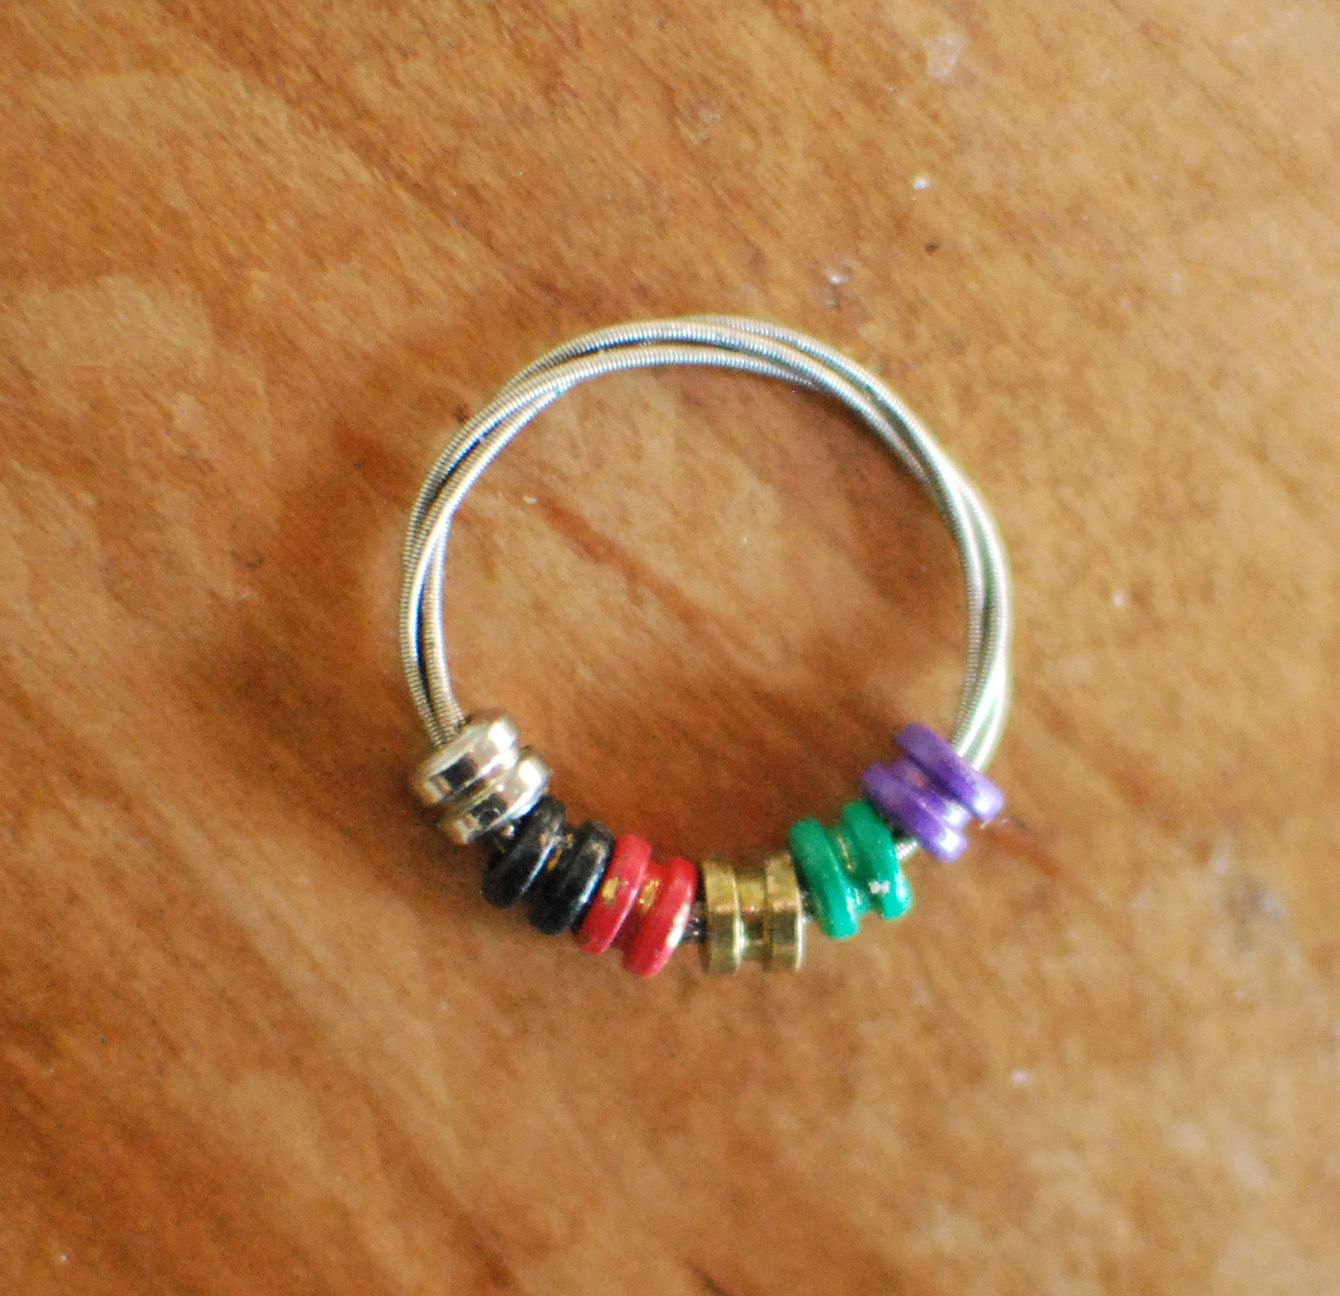 Design Your Own Custom Bangle Charm Bracelet Pick Your Charms: Custom Guitar String Fidget Ring, Design Your Own, Choose